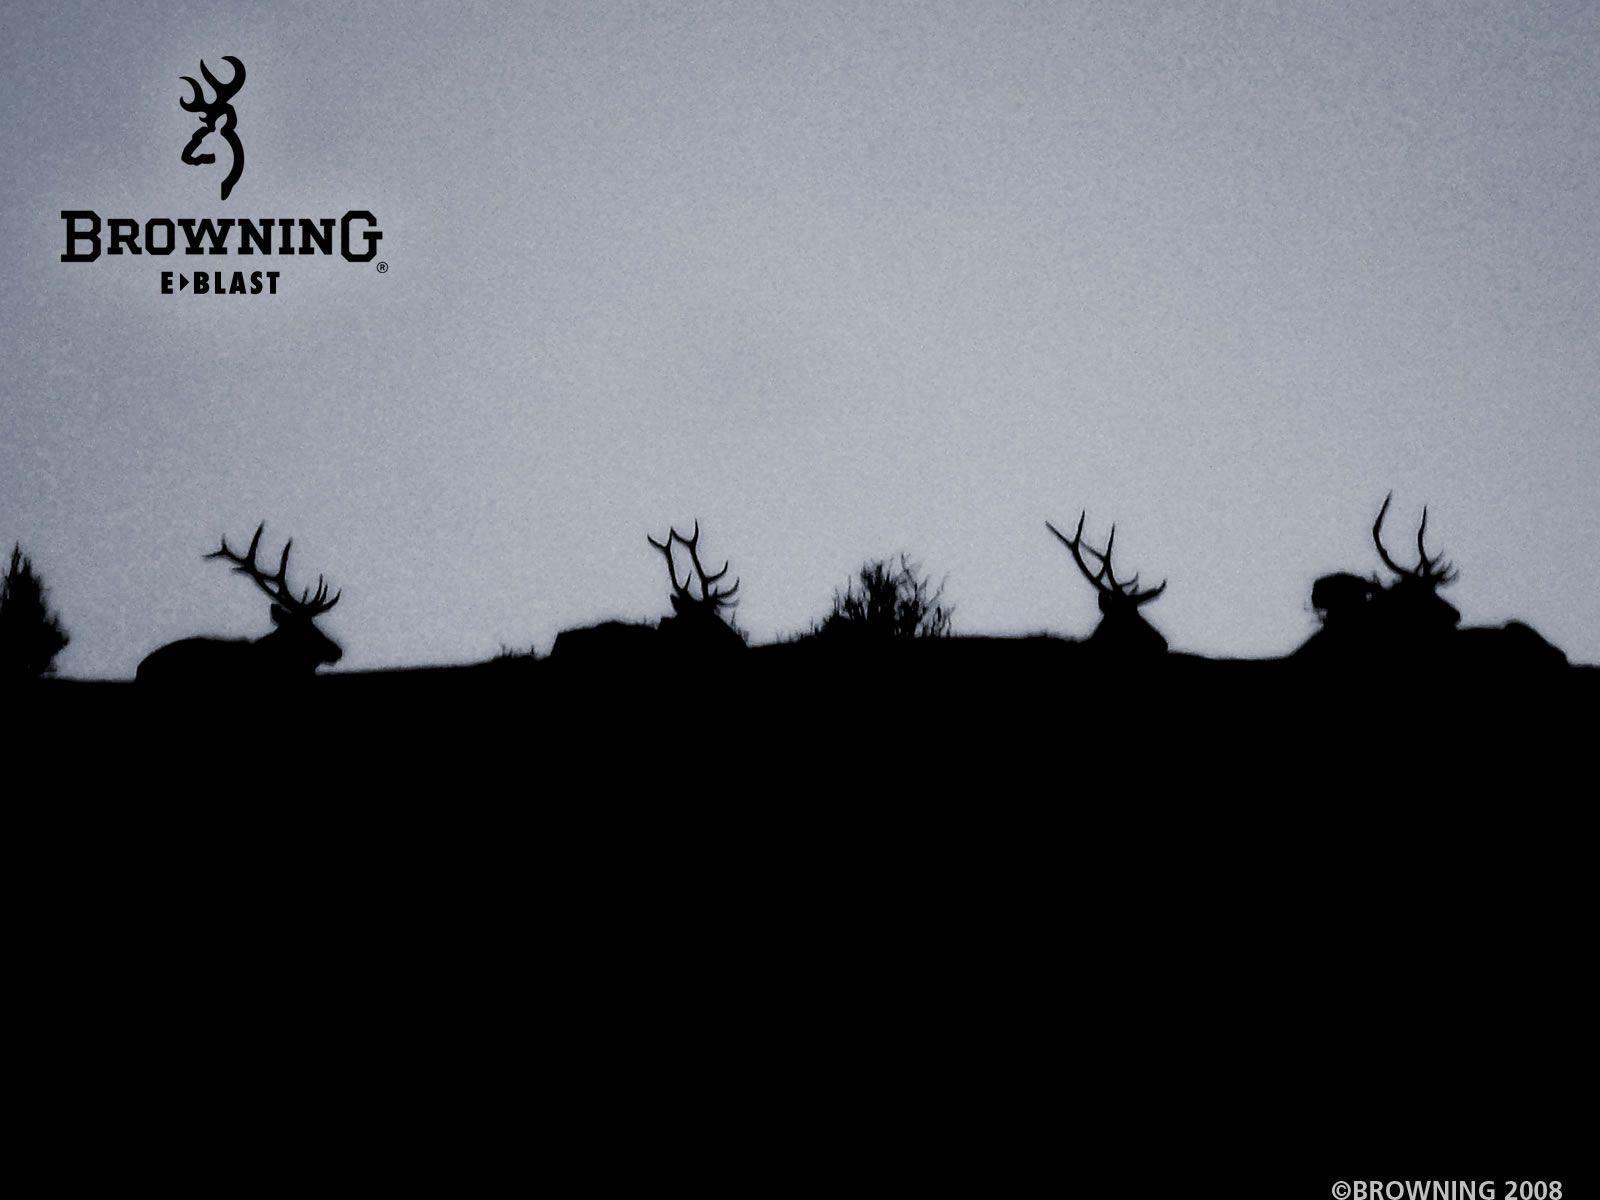 Browning Desktop Wallpapers - Top Free